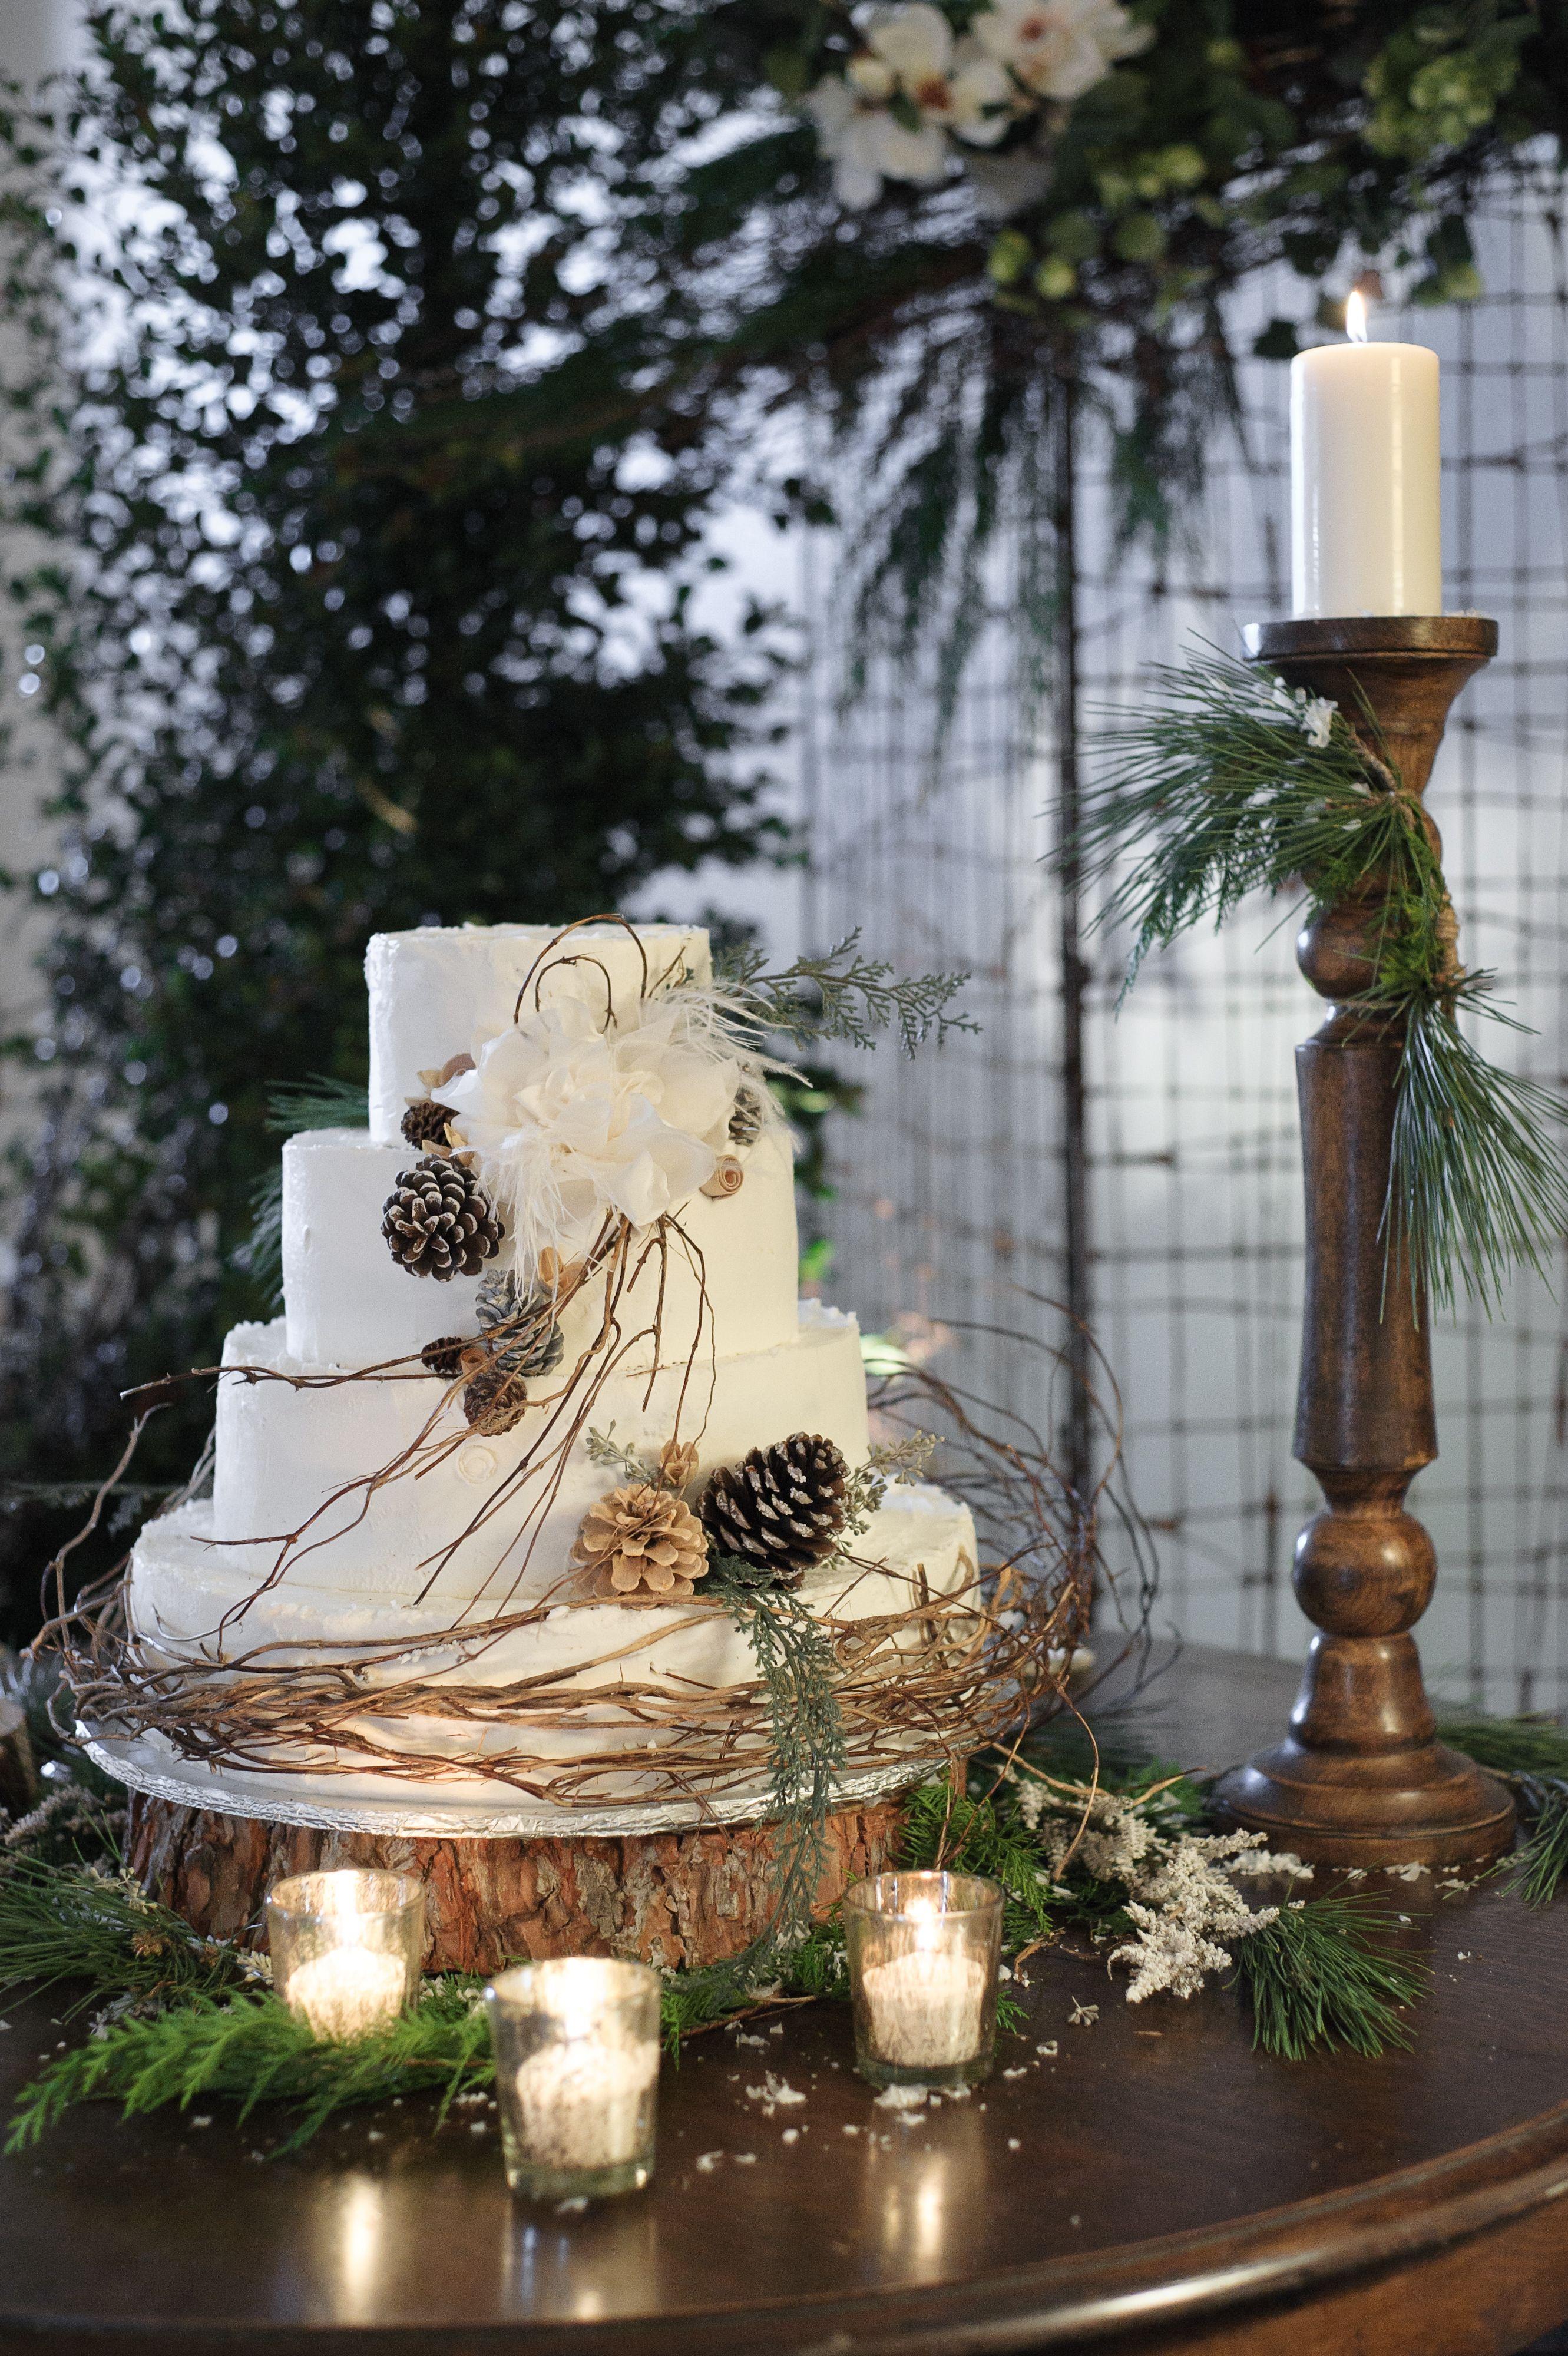 winter weddings sparkle with dramatic elegance partydeko ideen pinterest hochzeitstorte. Black Bedroom Furniture Sets. Home Design Ideas